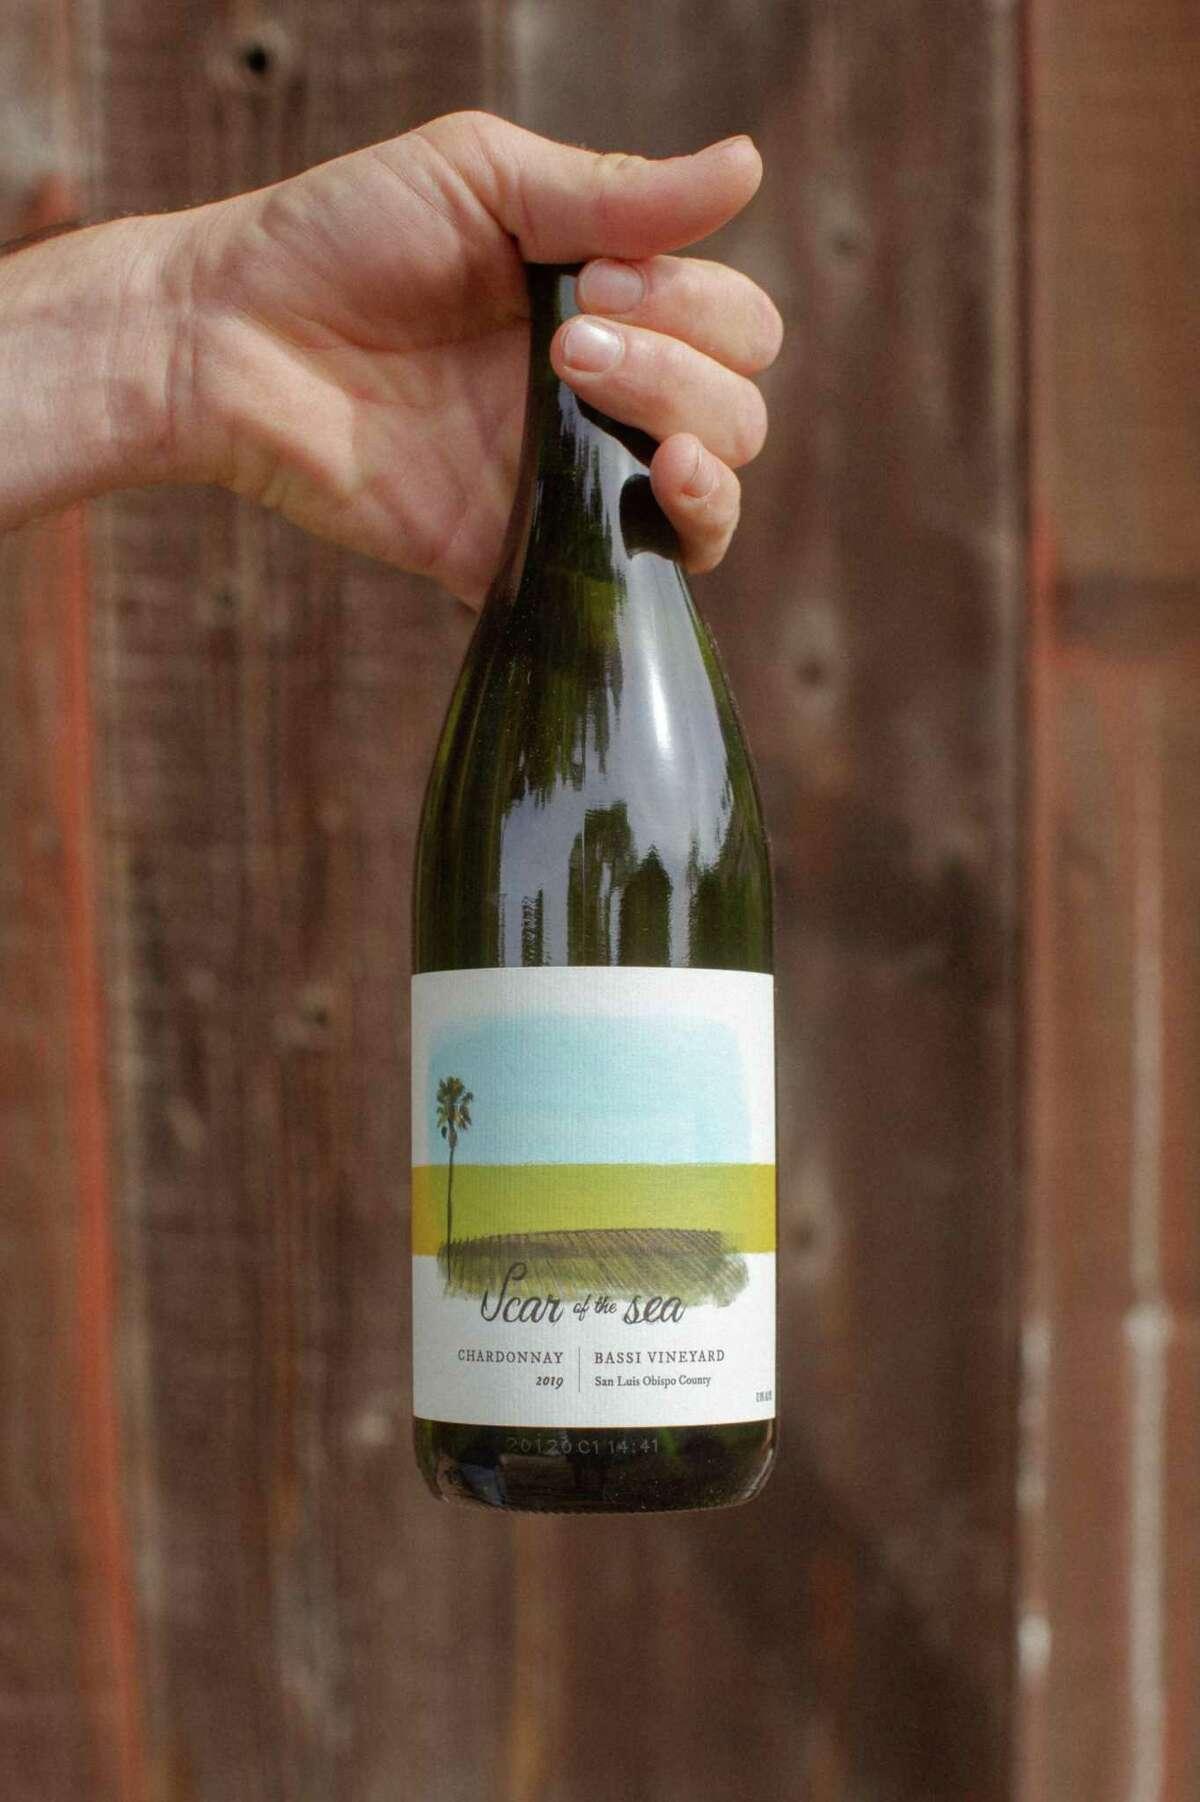 Scar of the Sea's Bassi Vineyard Chardonnay, from a vineyard in Avila Beach in San Luis Obispo County.